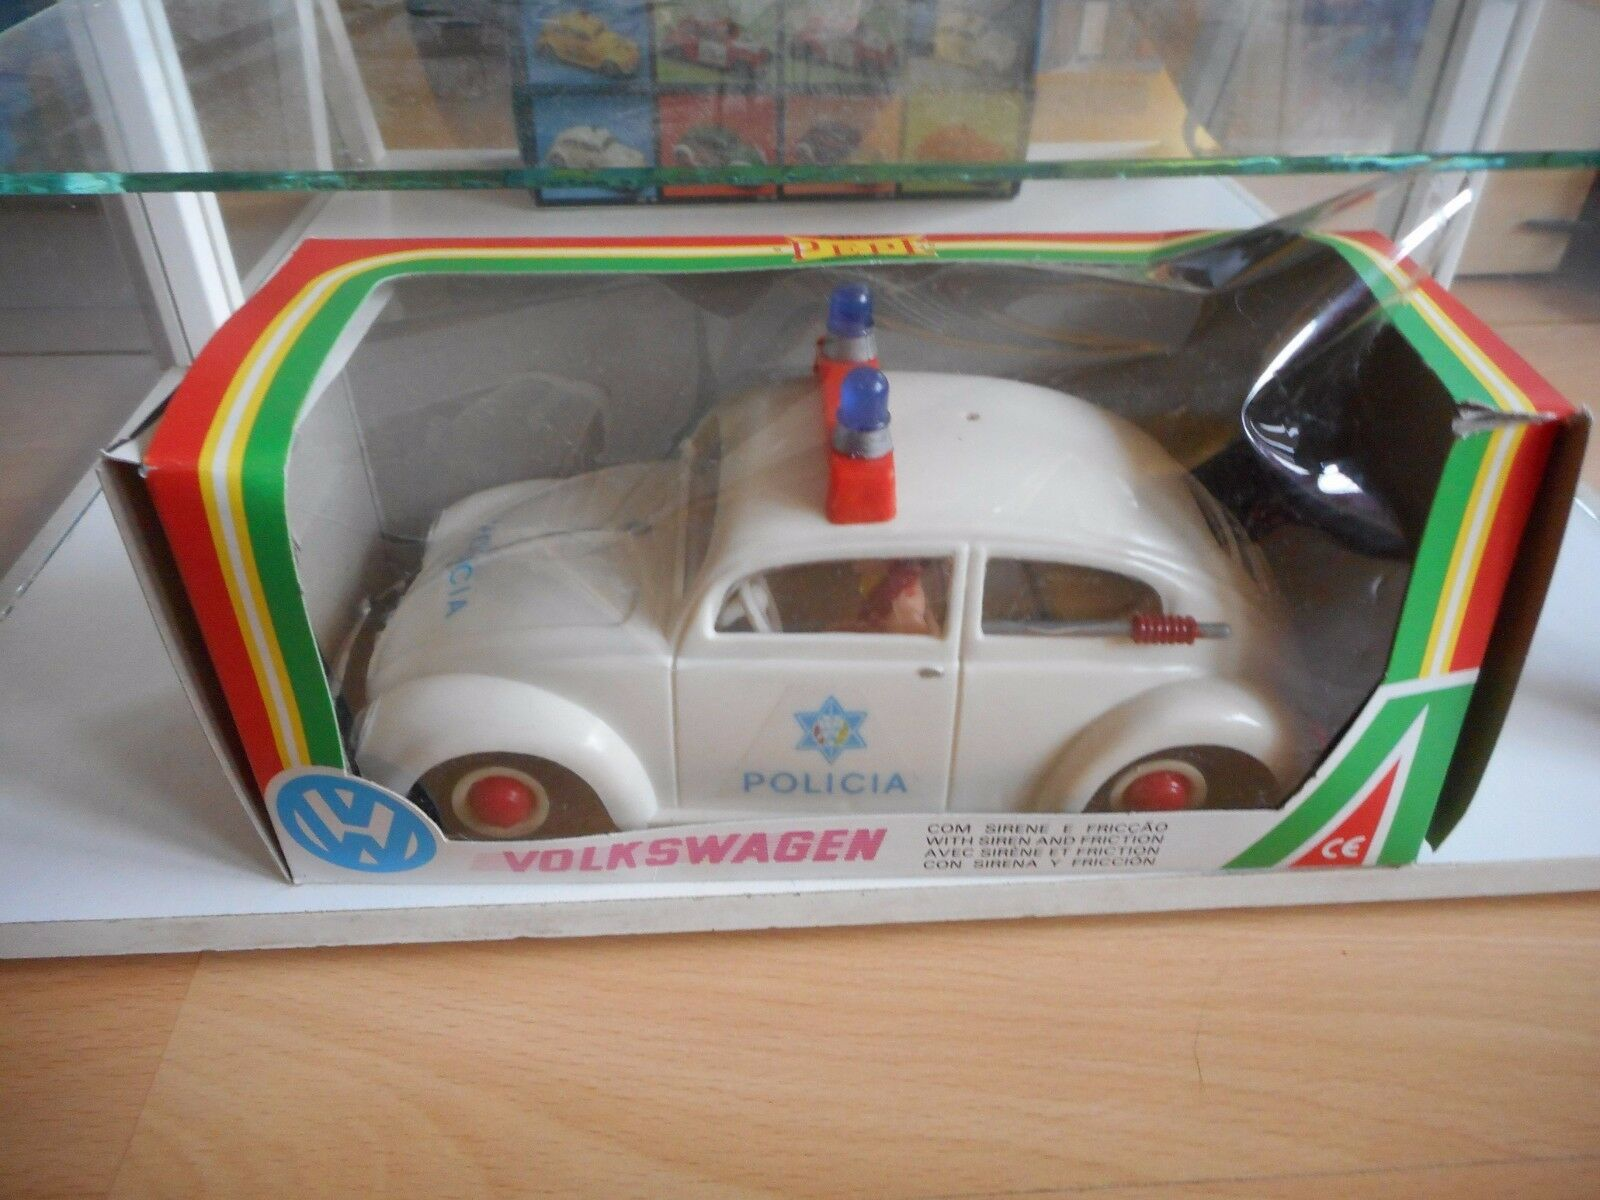 PEPE VW Volkswagen Beetle Policia in bianca in Box